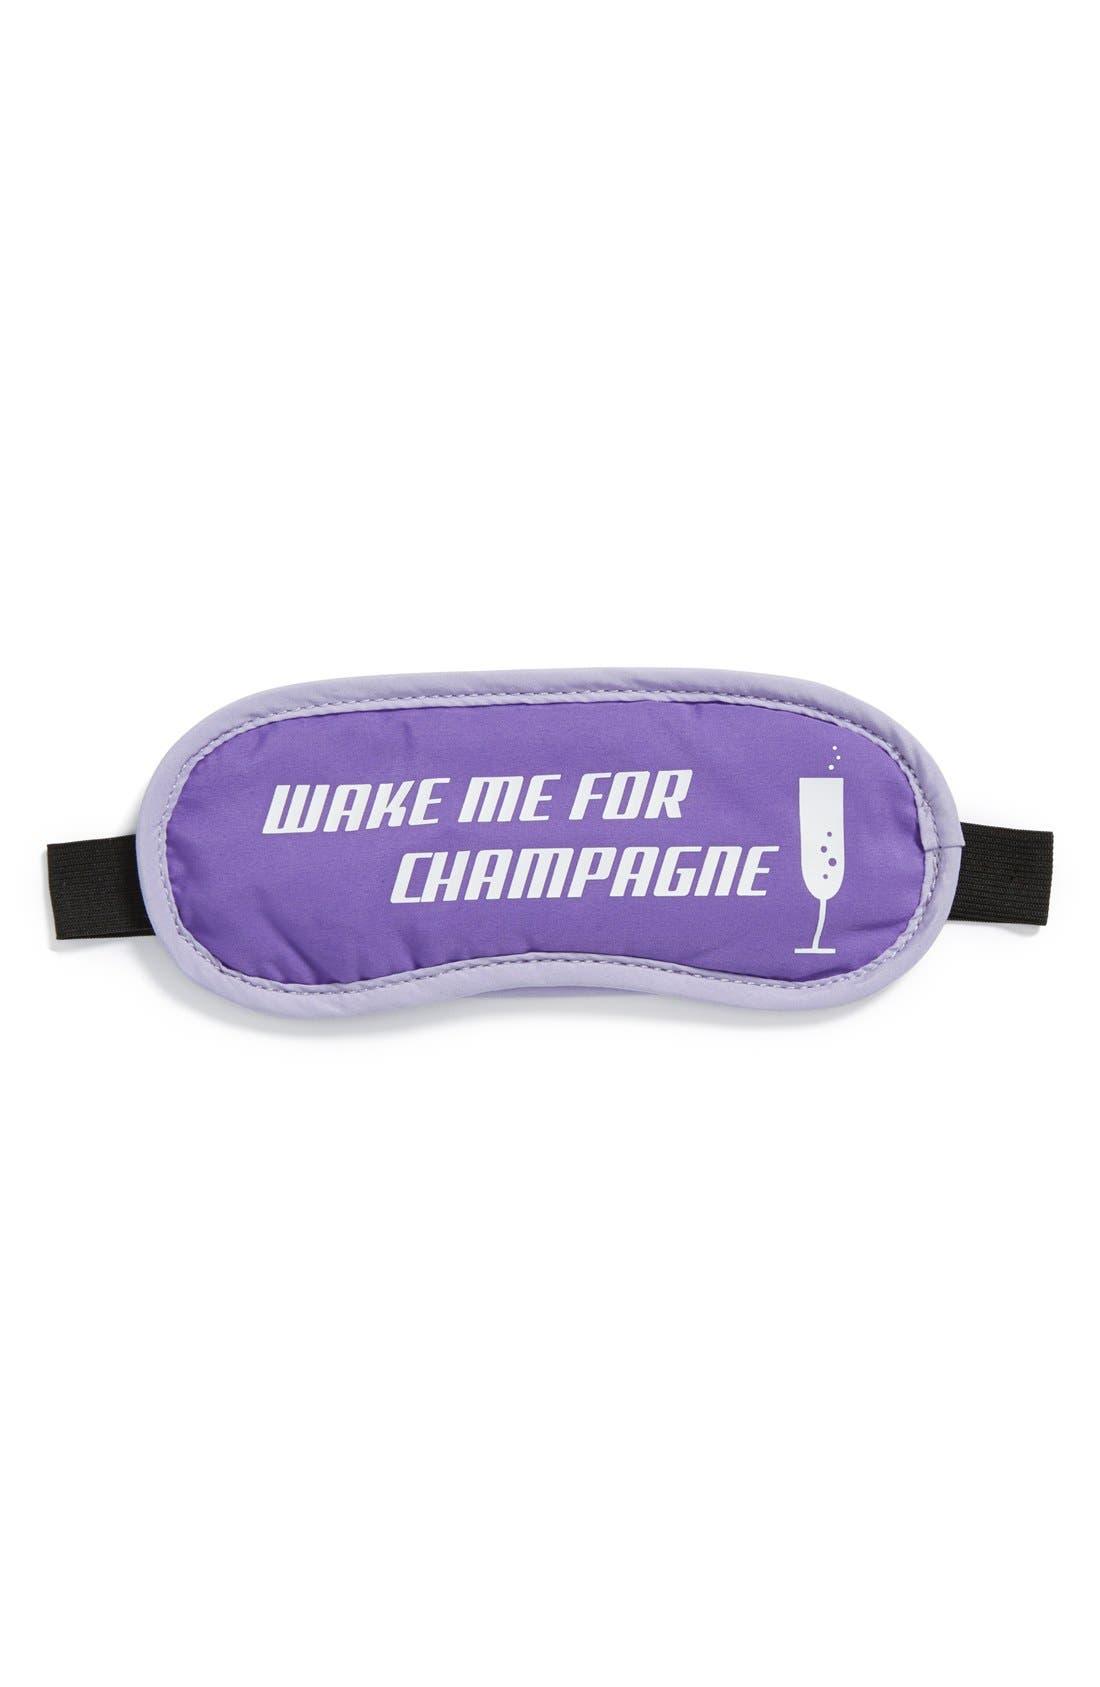 Main Image - Flight 001 'Wake Me for Champagne' Sleep Mask